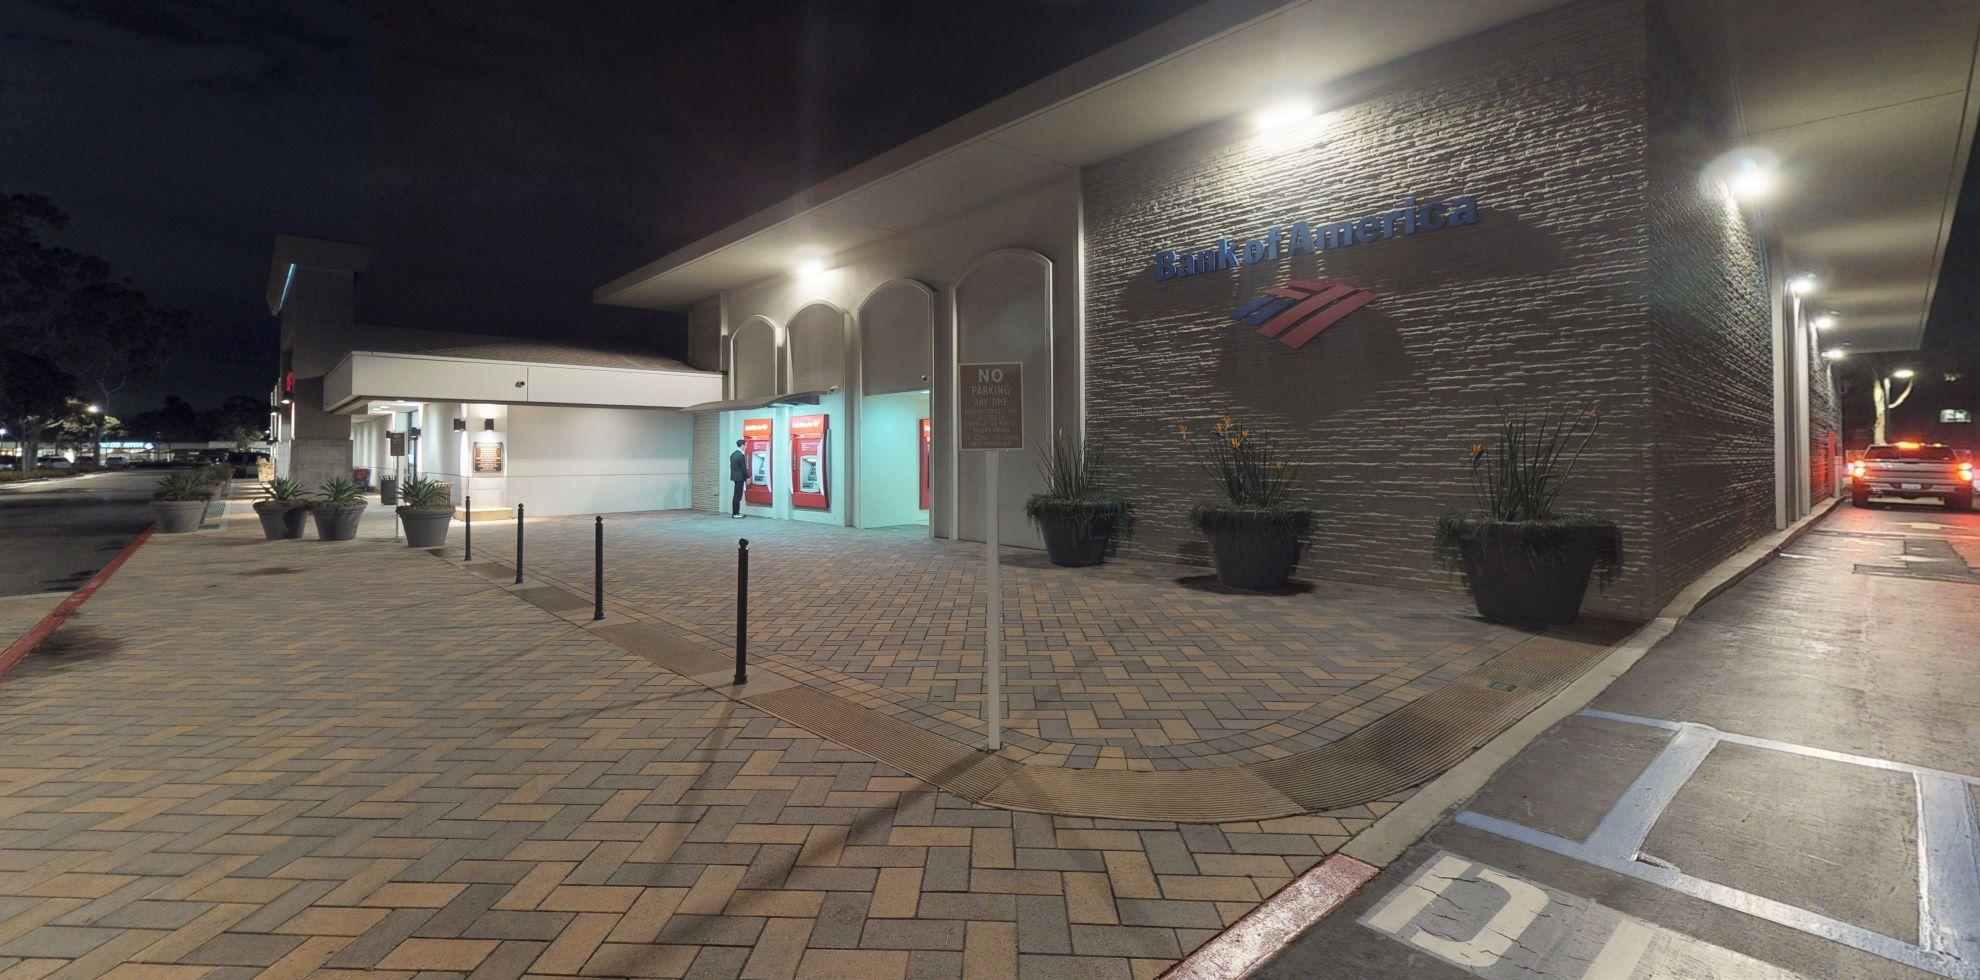 Bank of America financial center with drive-thru ATM   1016 Irvine Ave, Newport Beach, CA 92660